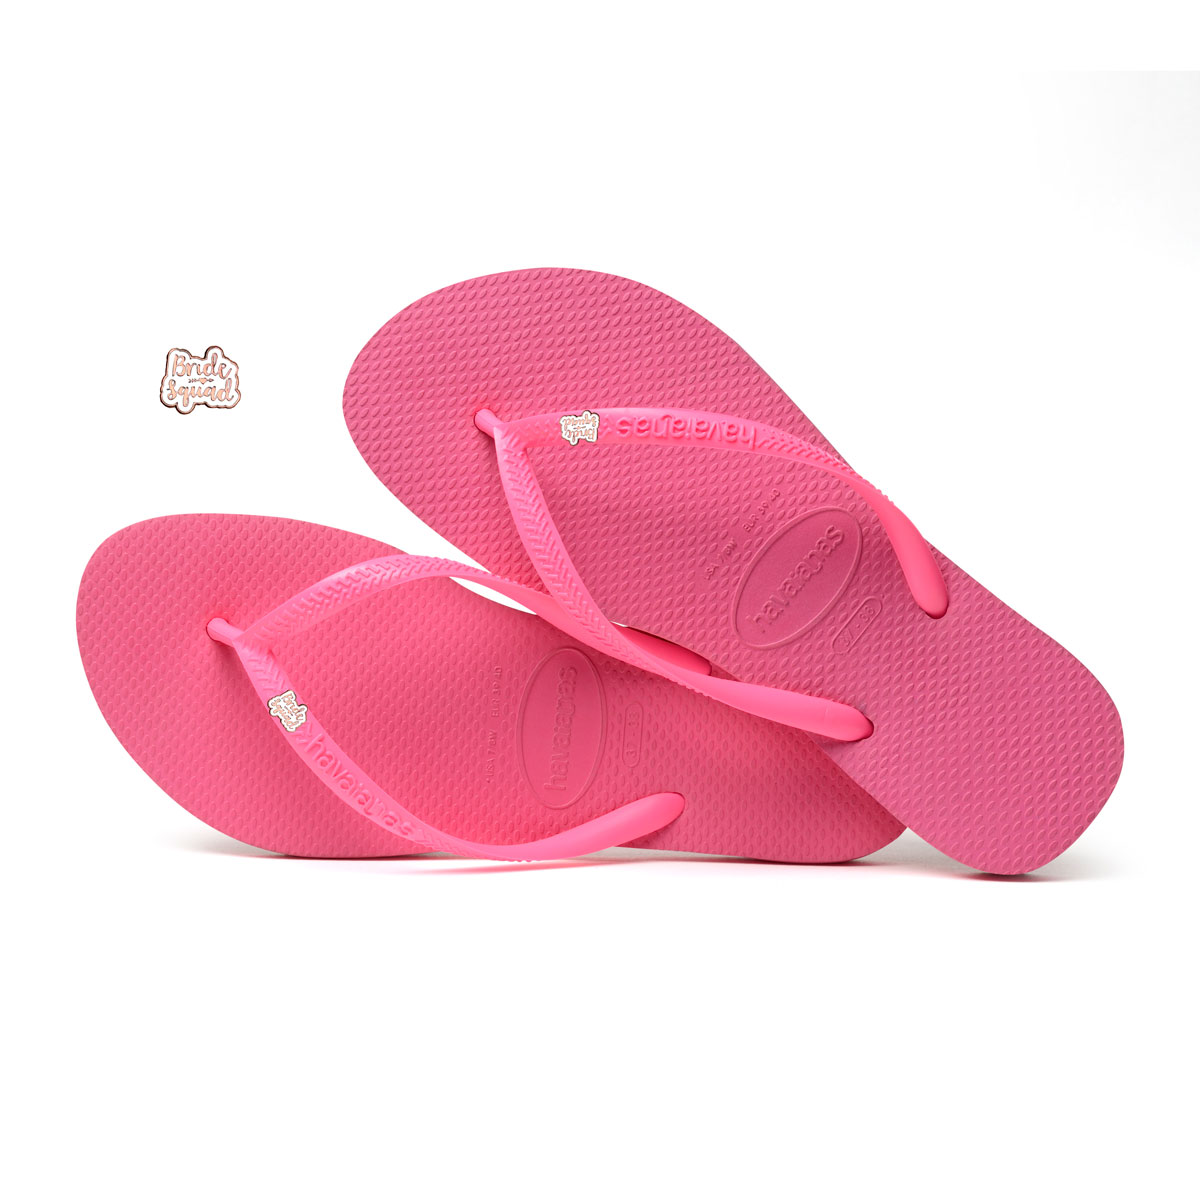 Havaianas Shocking Pink Flip Flops with Rose Gold Bride Squad Pin